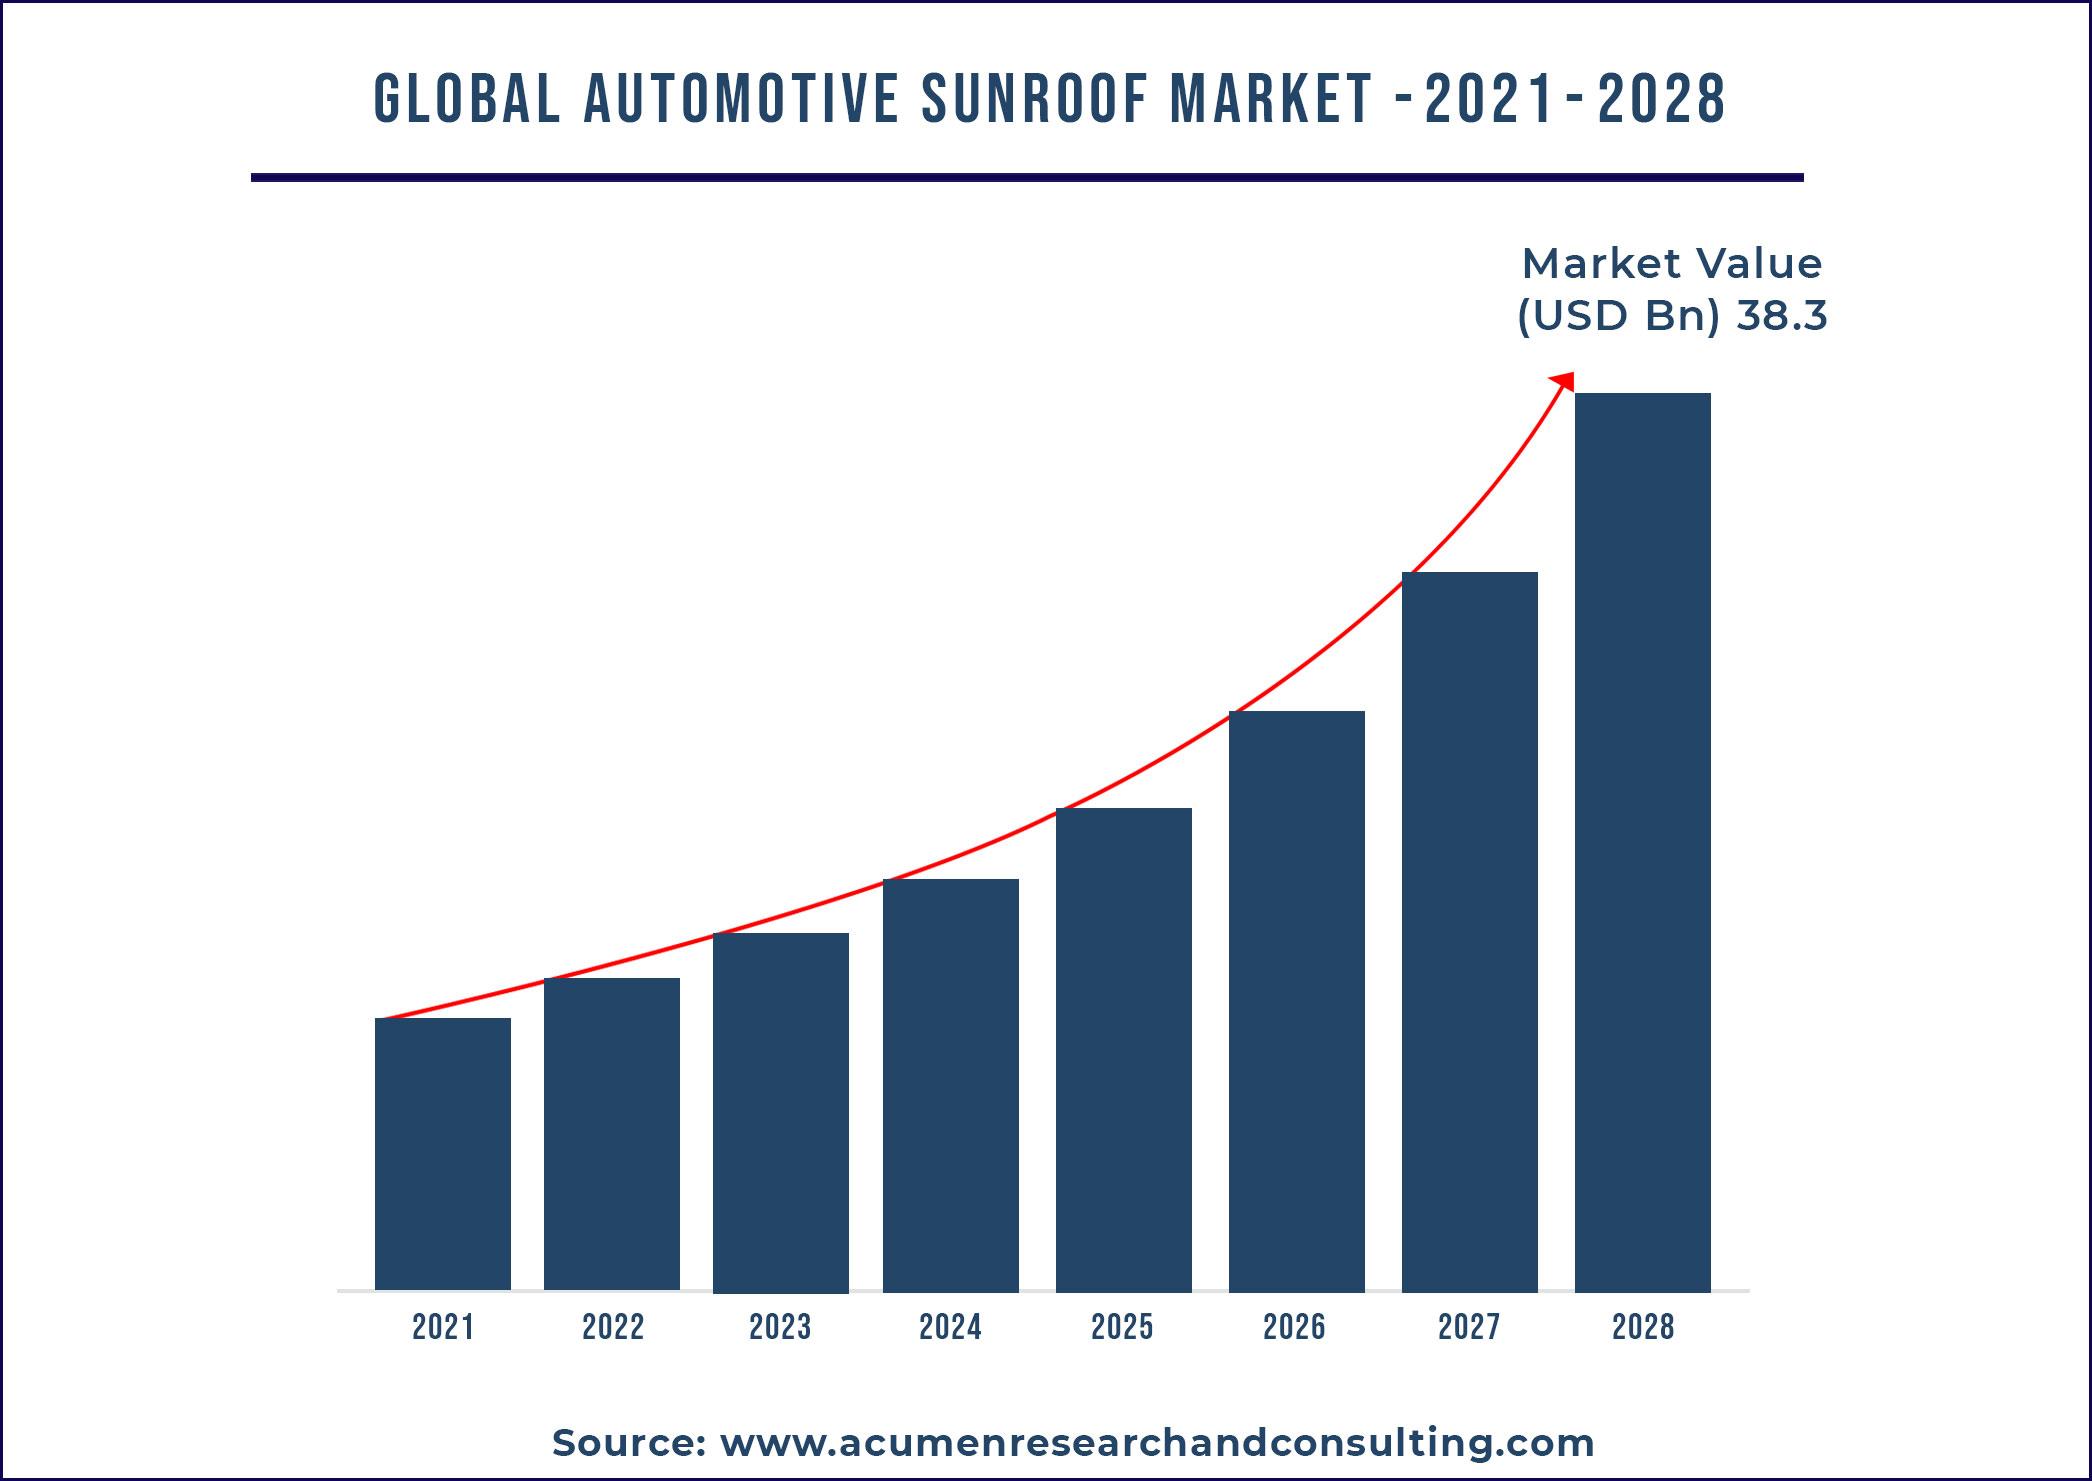 Automotive Sunroof Market By Size 2021-2028